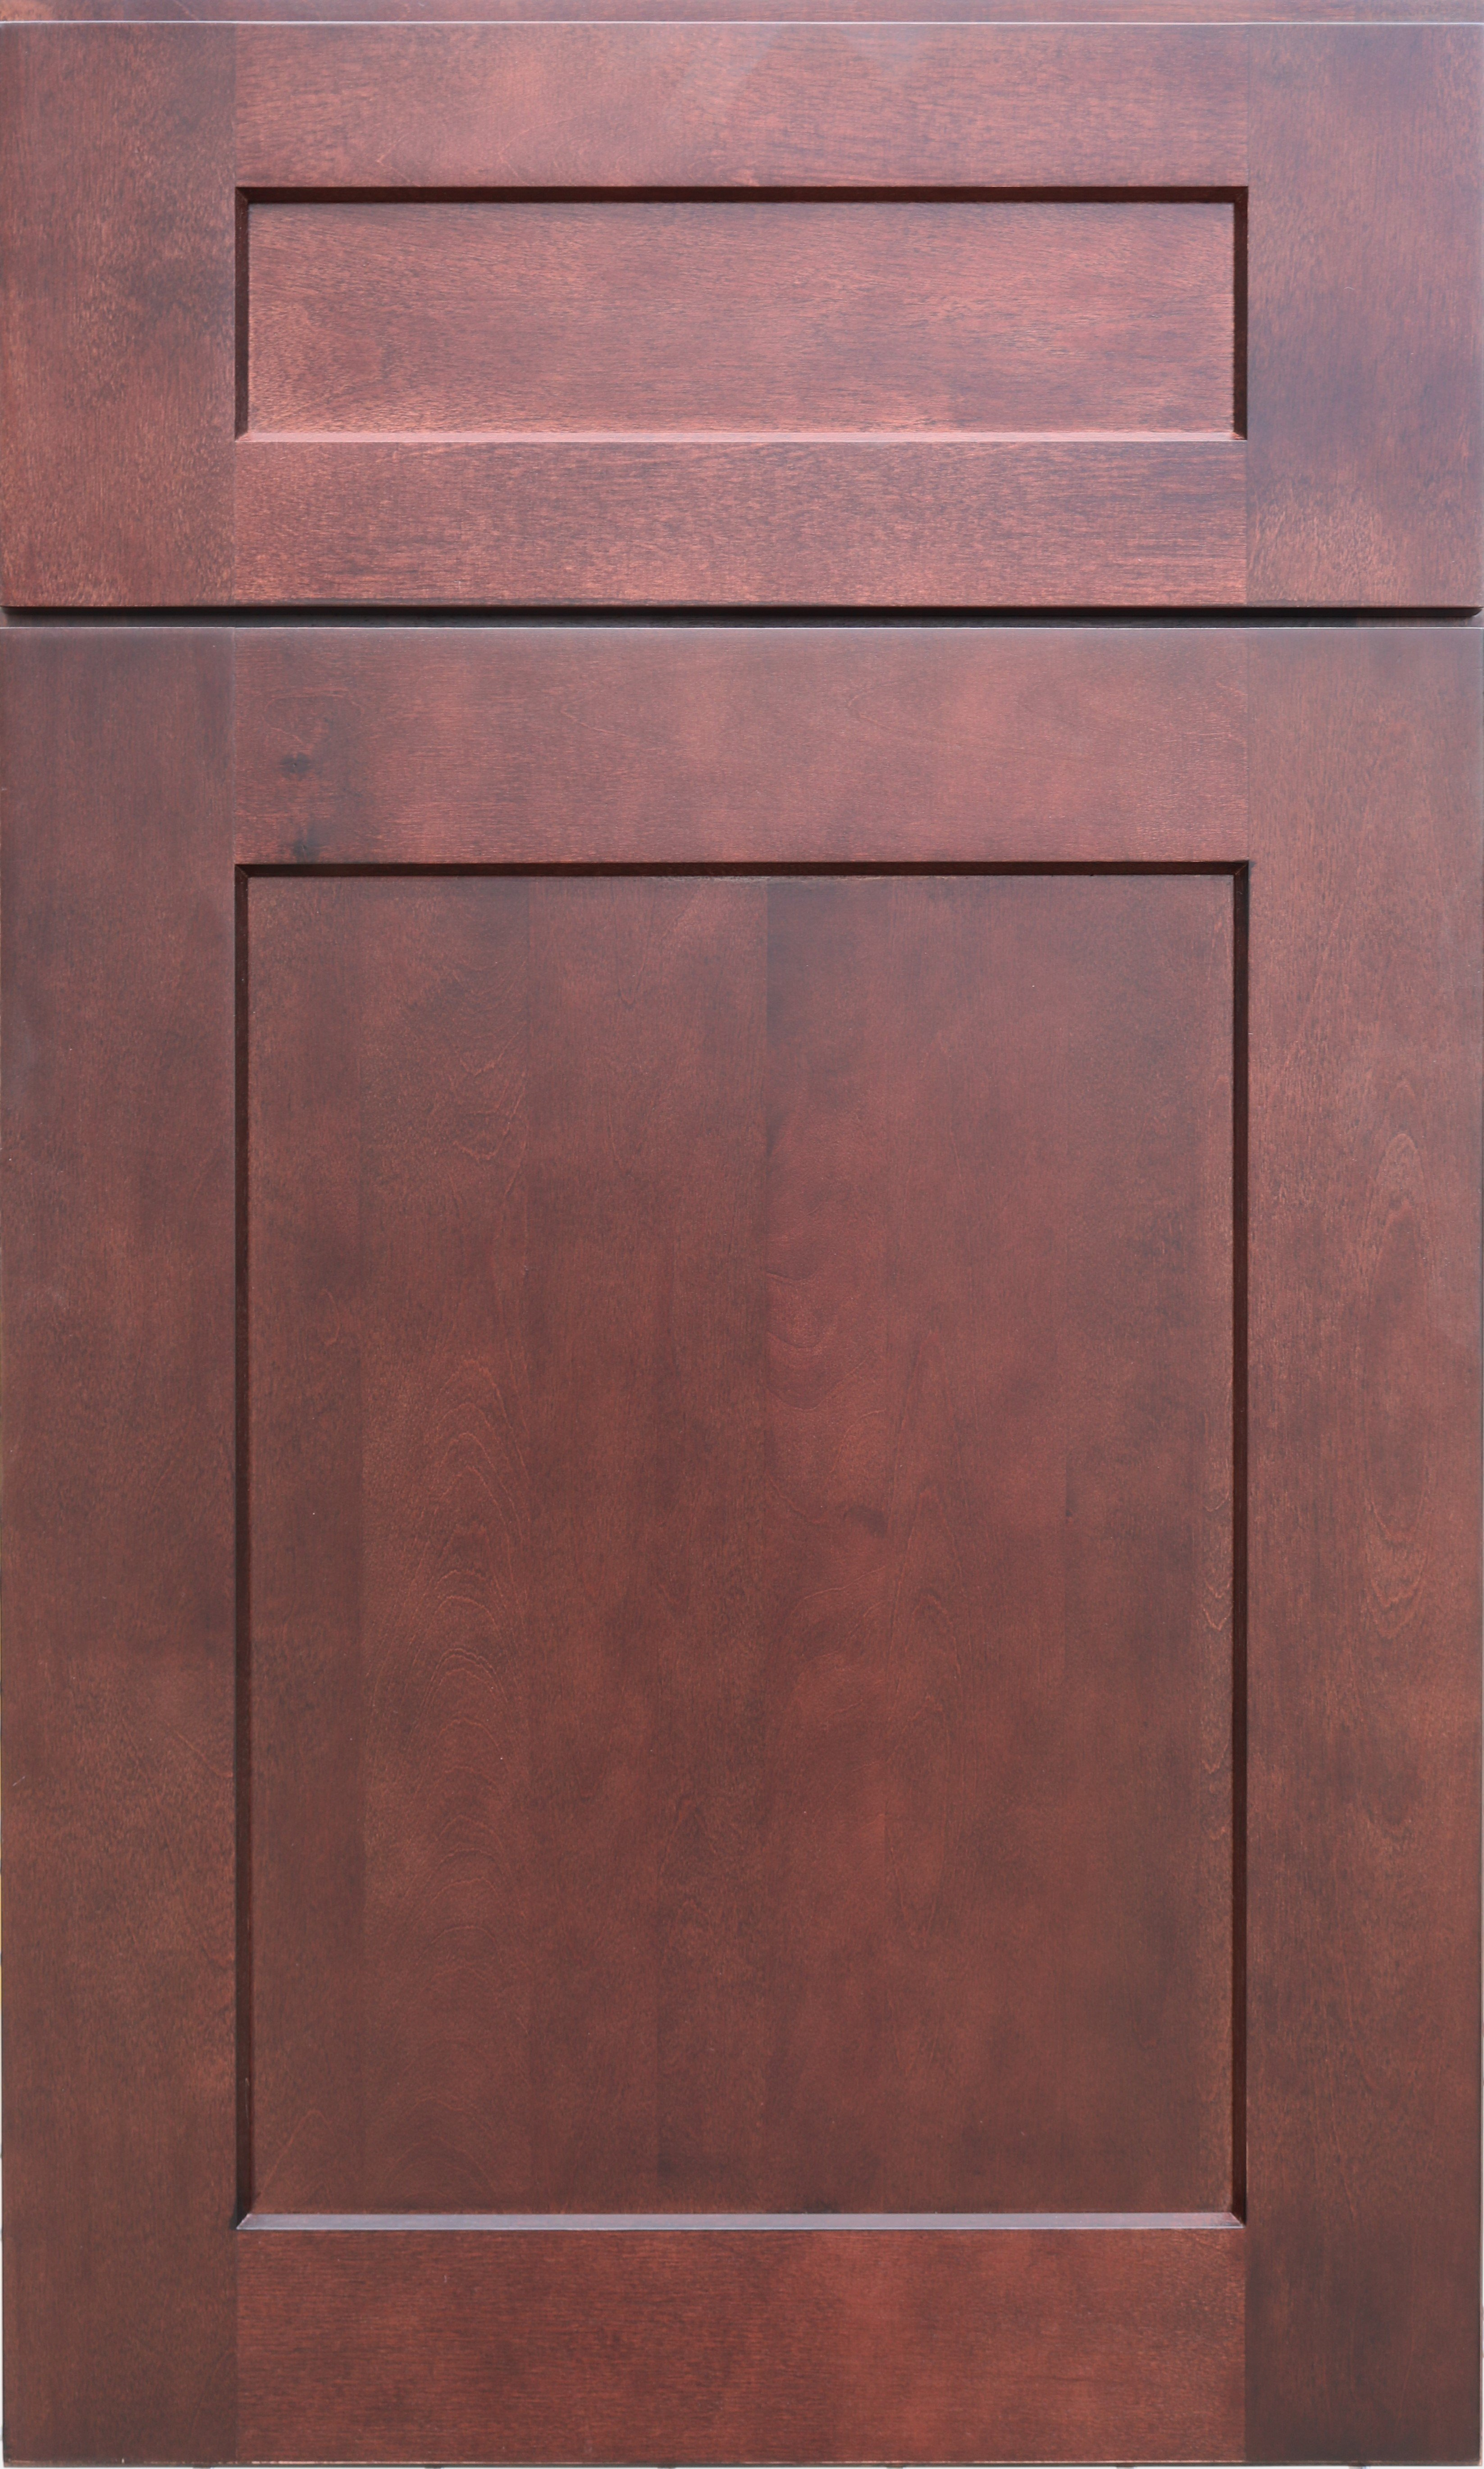 NKBC - Chestnut Brown Wholesale Cabinets